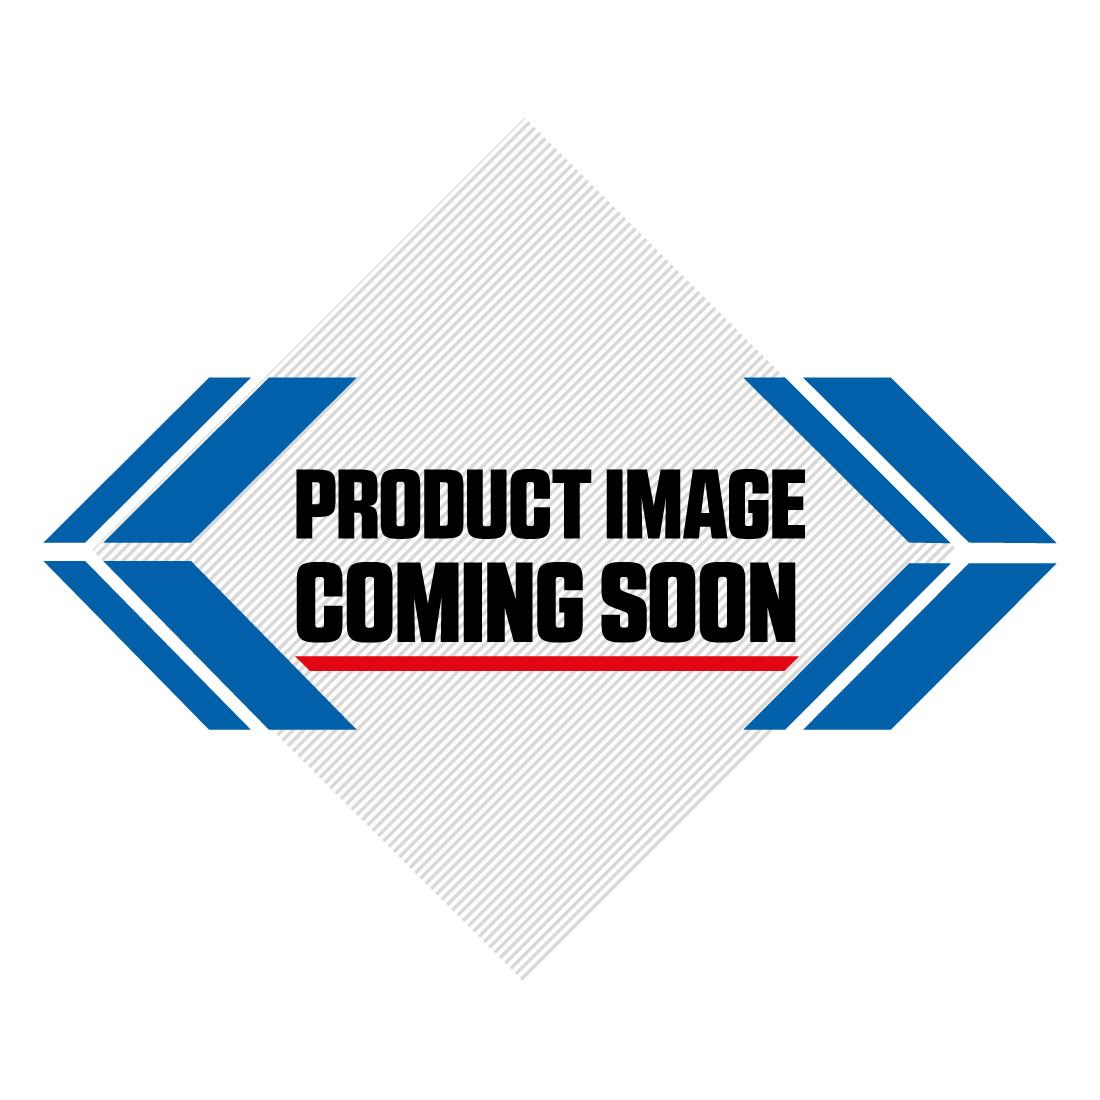 Suzuki Plastic Kit RMZ 450 (2013) OEM Factory Image-0